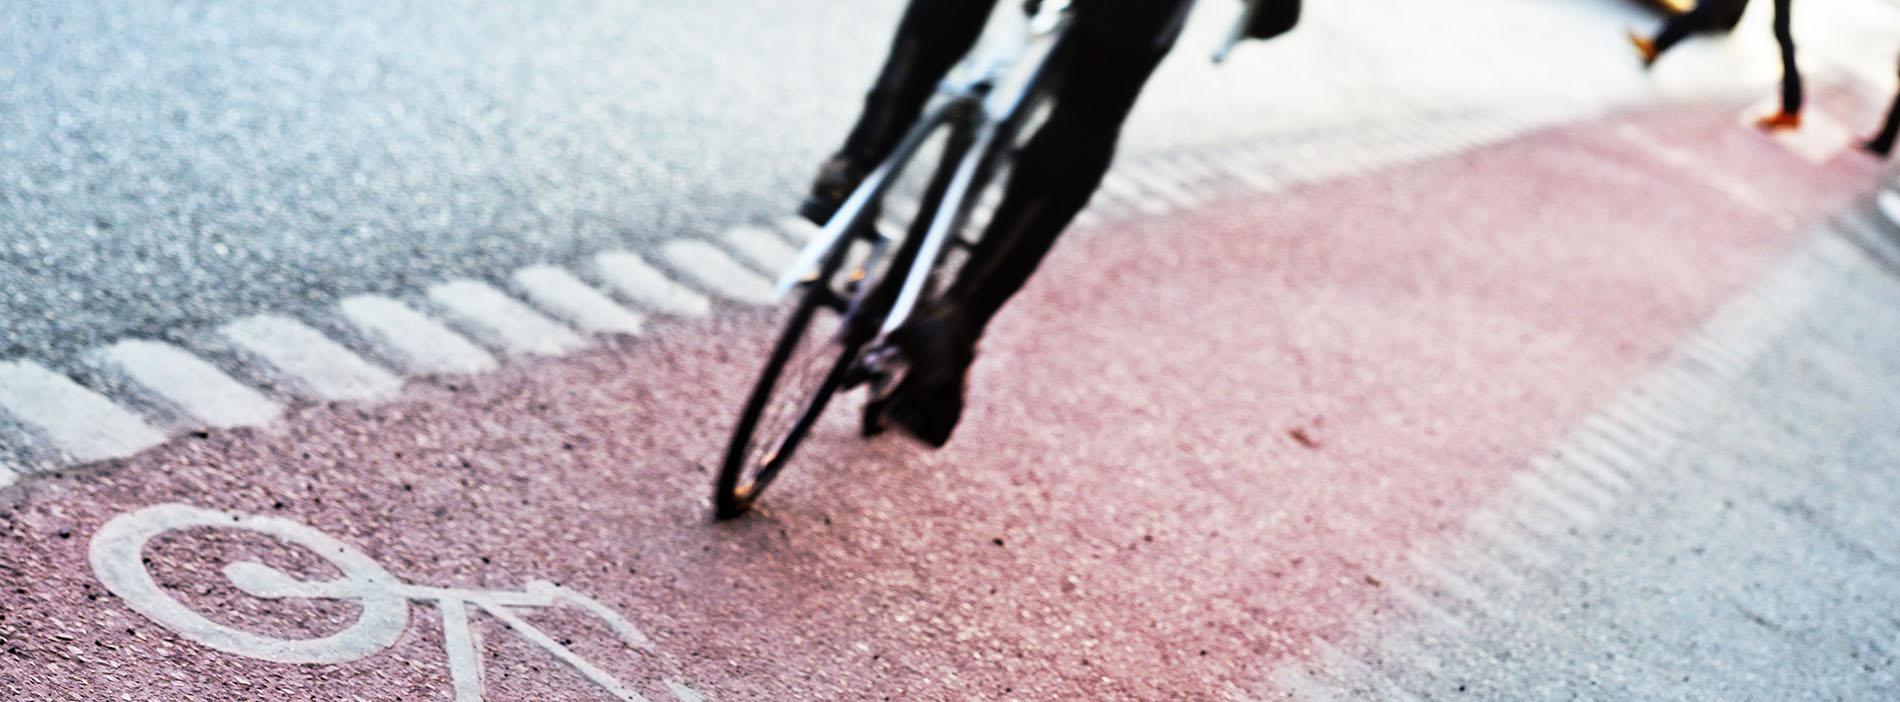 cinesi rutes bicicleta